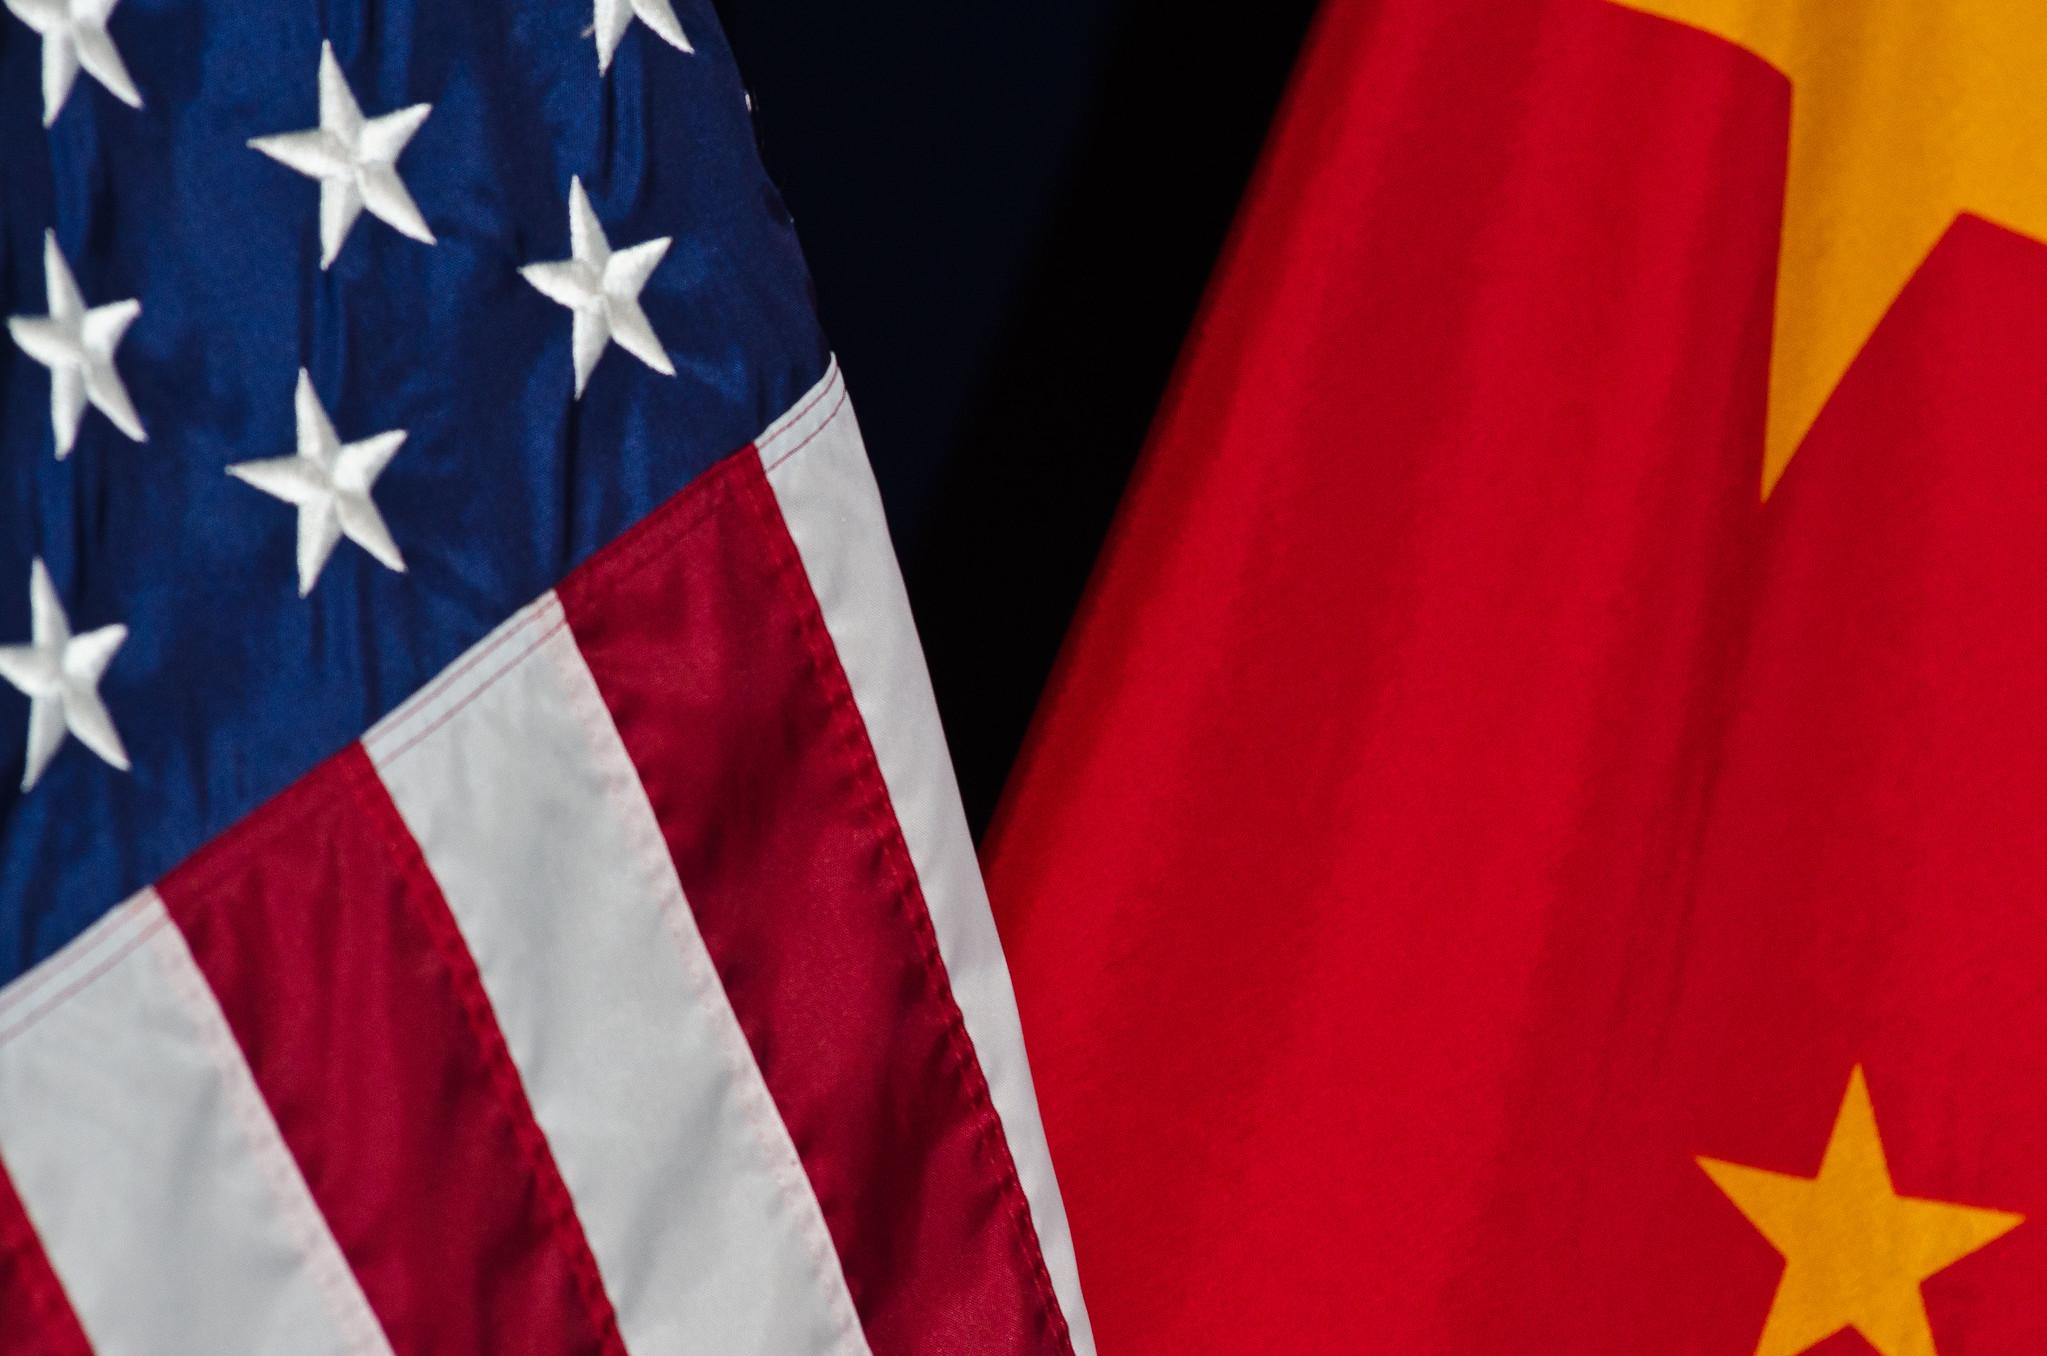 Eskalacja sankcji USA-Chiny